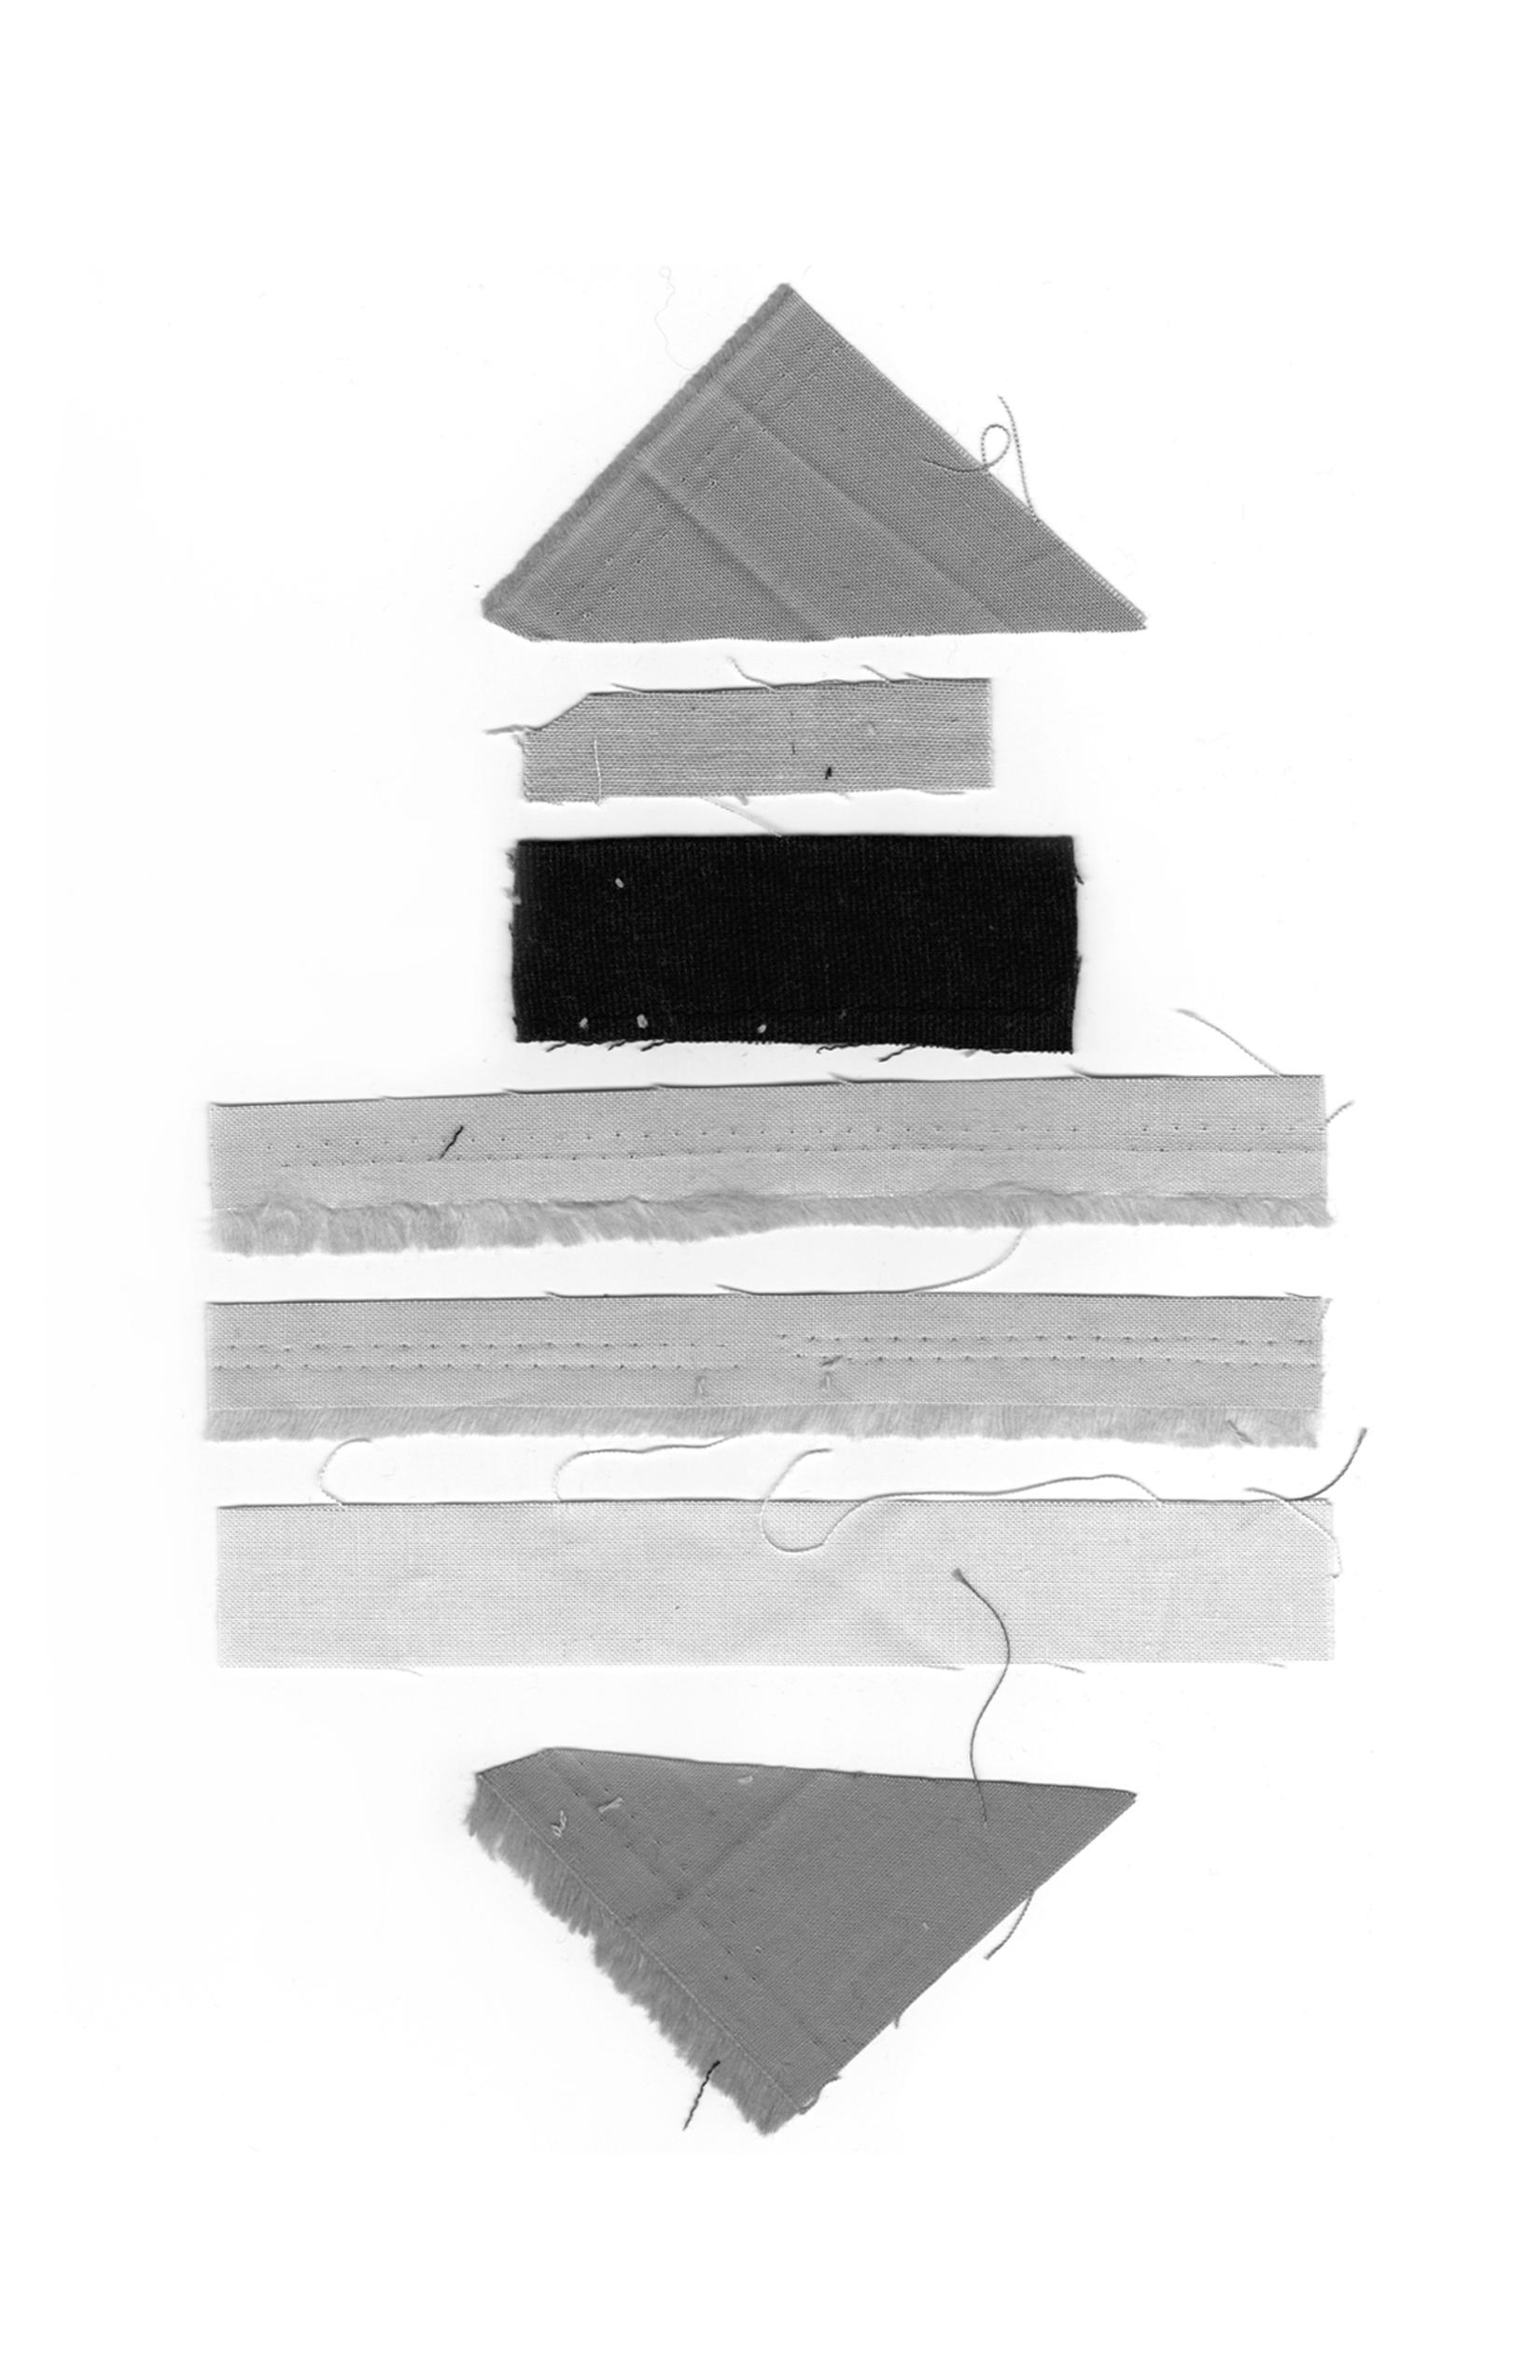 scraps_page6.jpg